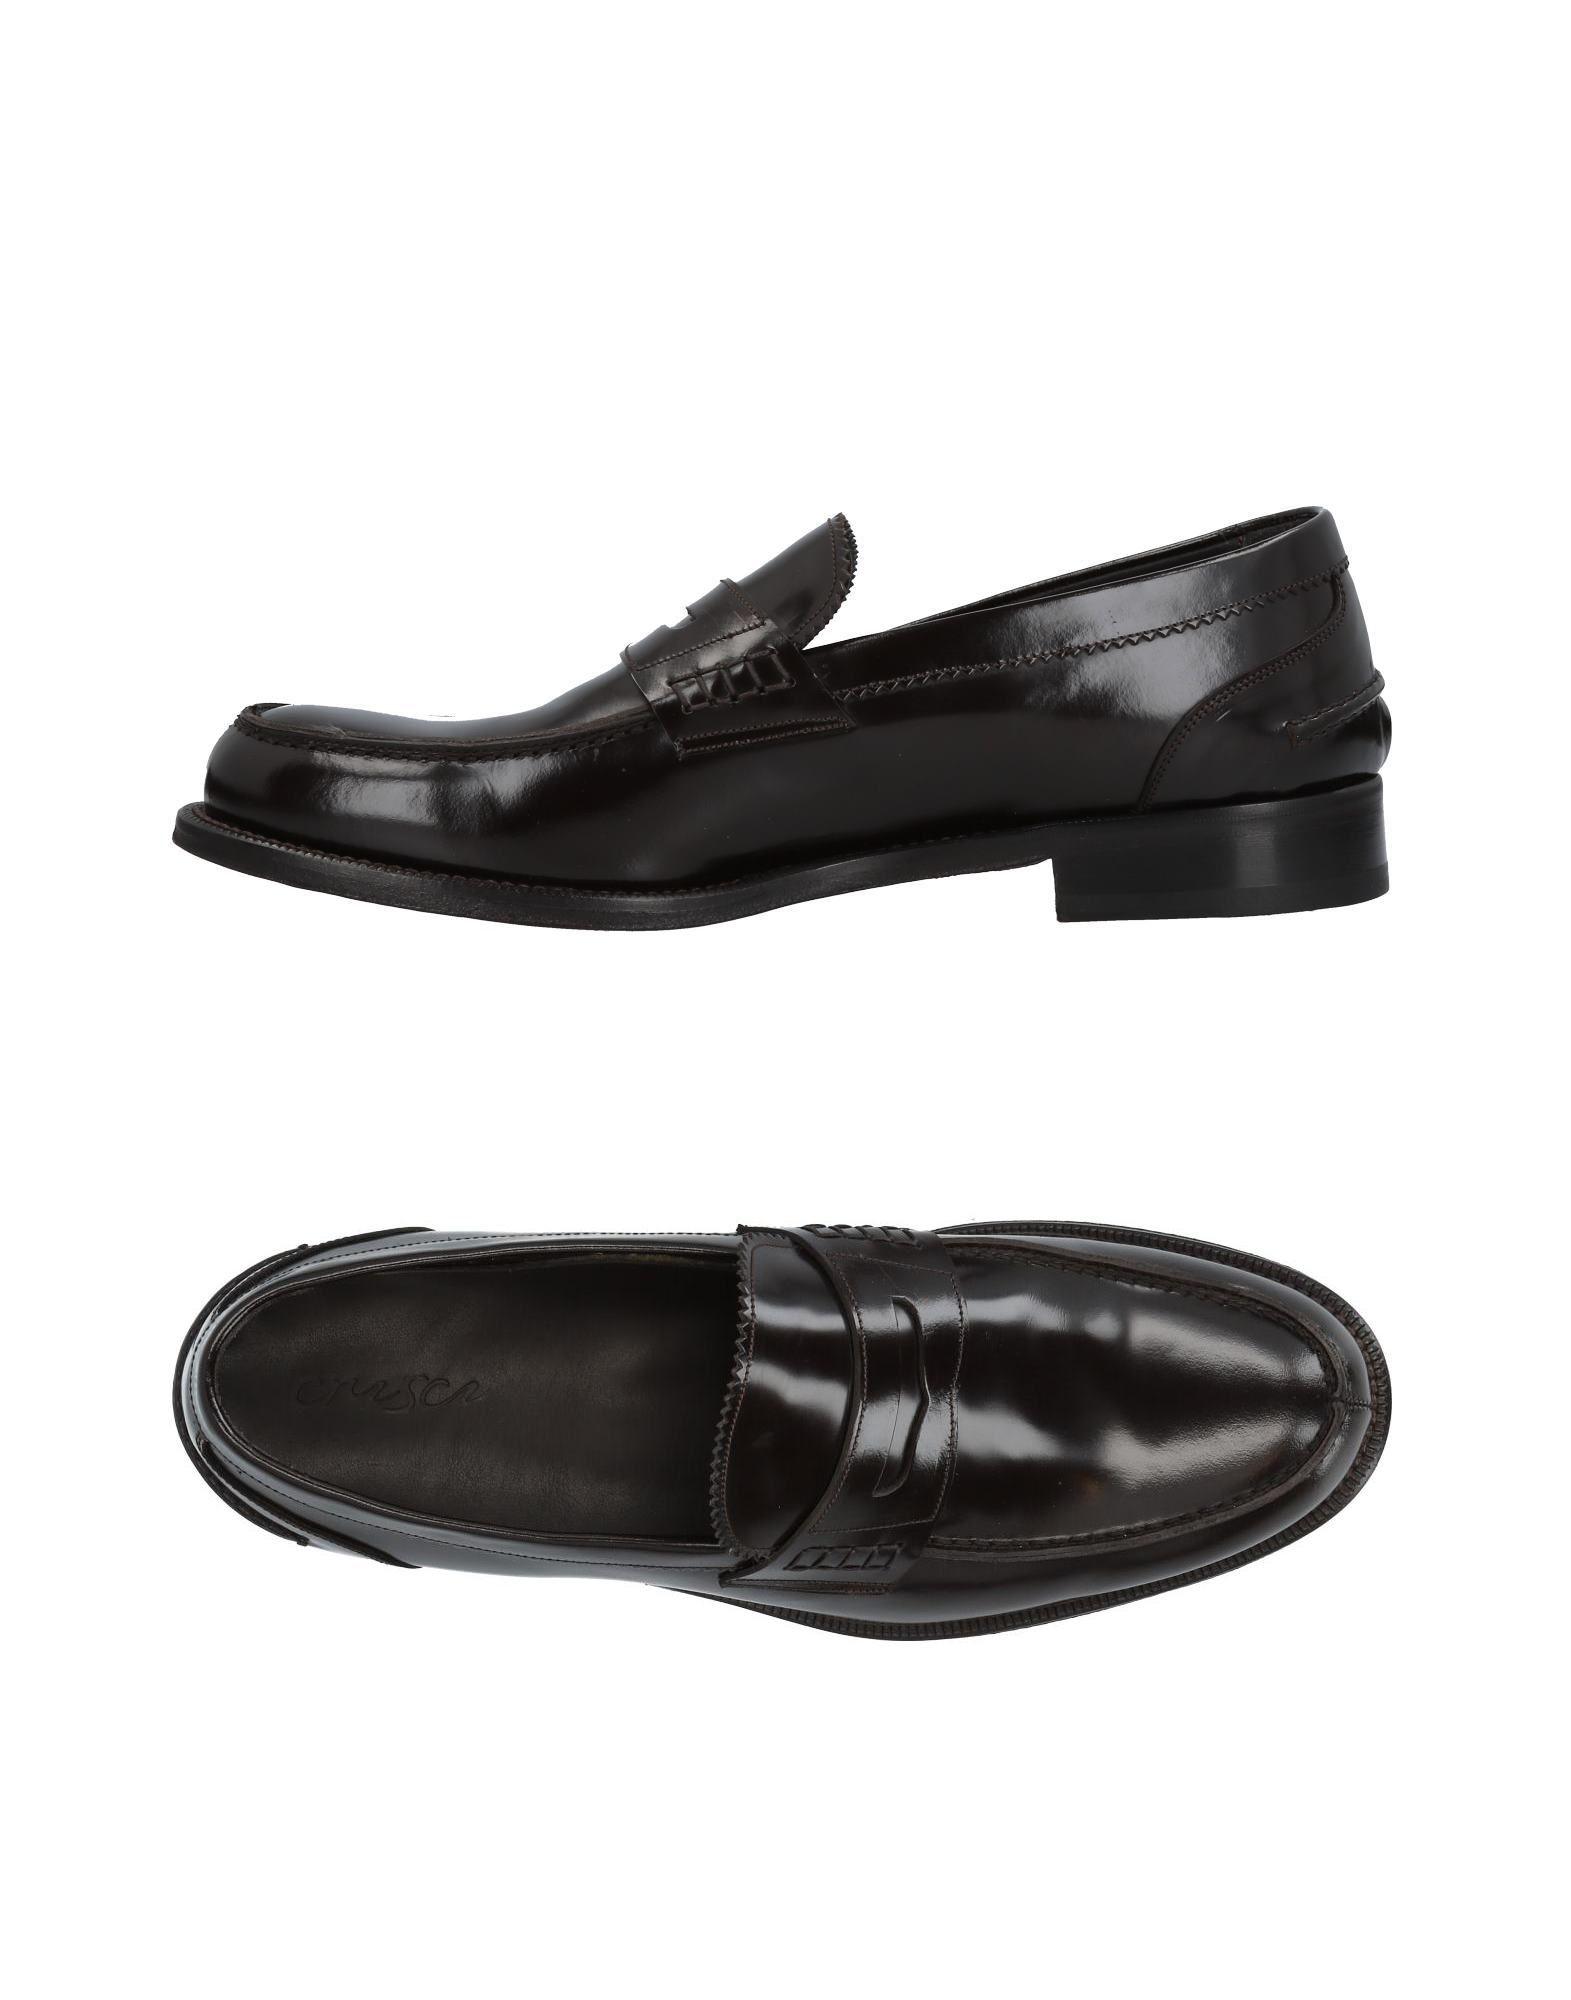 Rabatt echte  Schuhe Crisci Mokassins Herren  echte 11454024QN 733e91